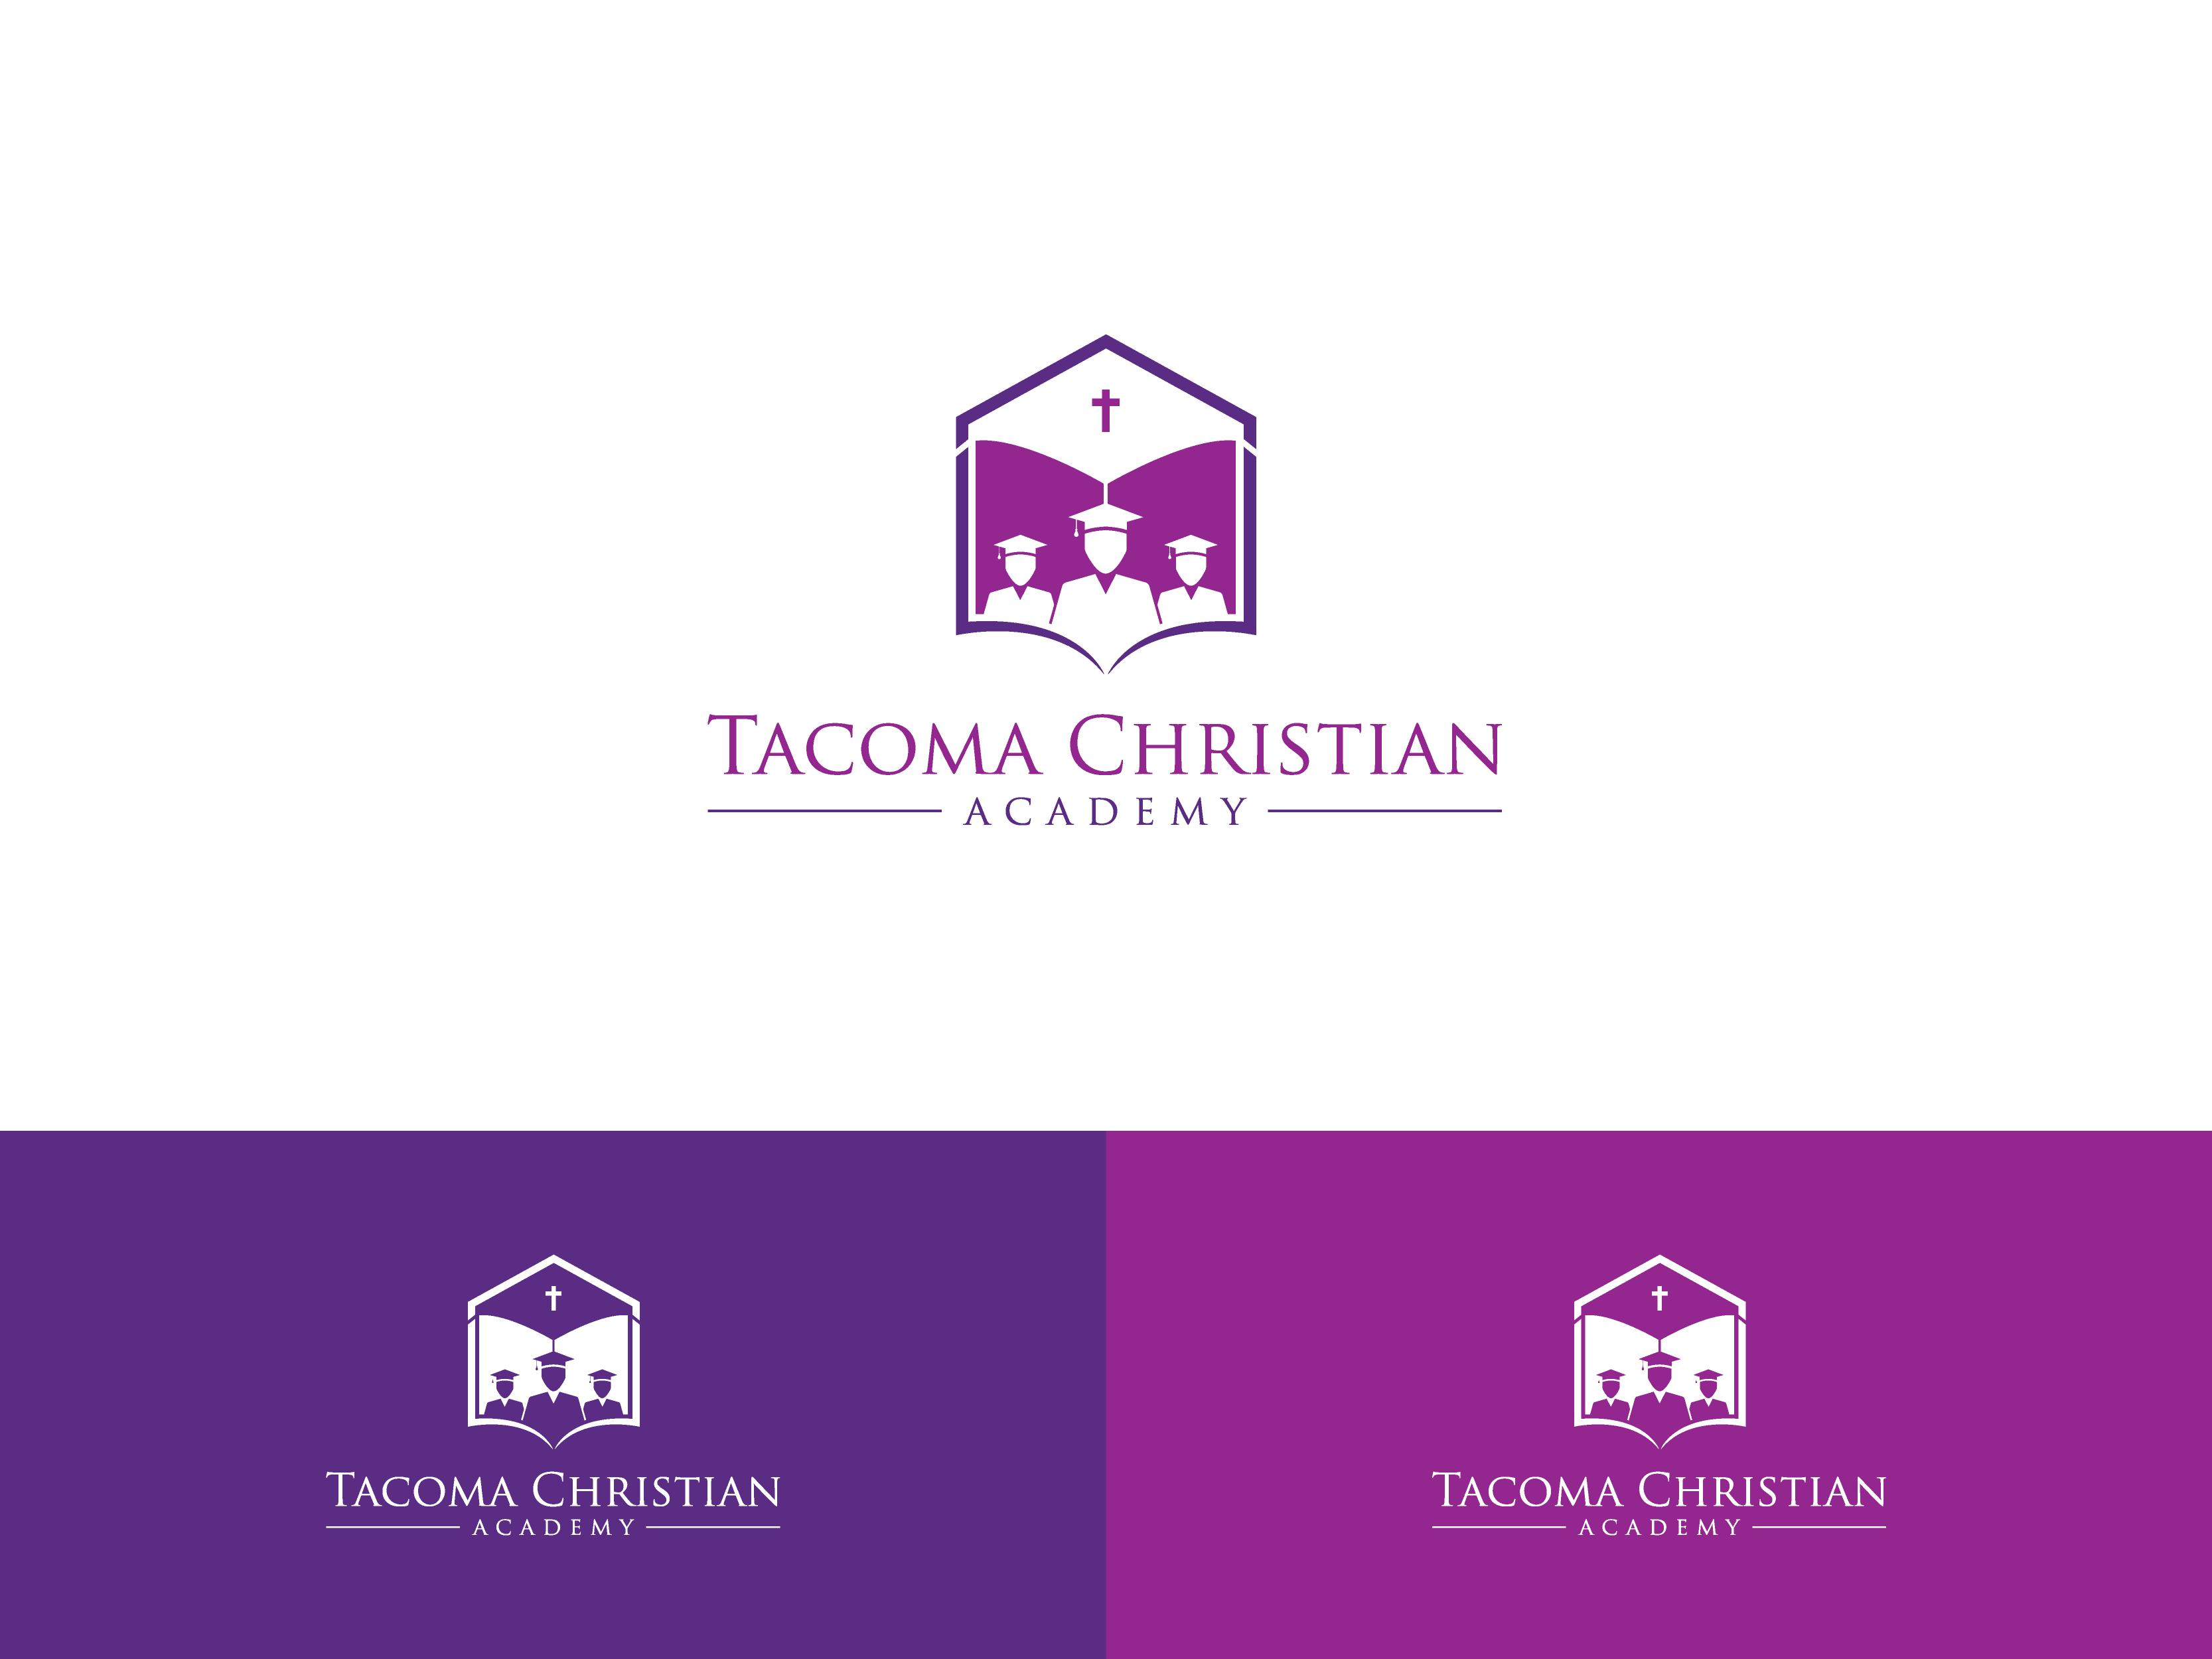 Logo Design by Shivaprasad Sangondimath - Entry No. 94 in the Logo Design Contest Imaginative Logo Design for Tacoma Christian Academy.